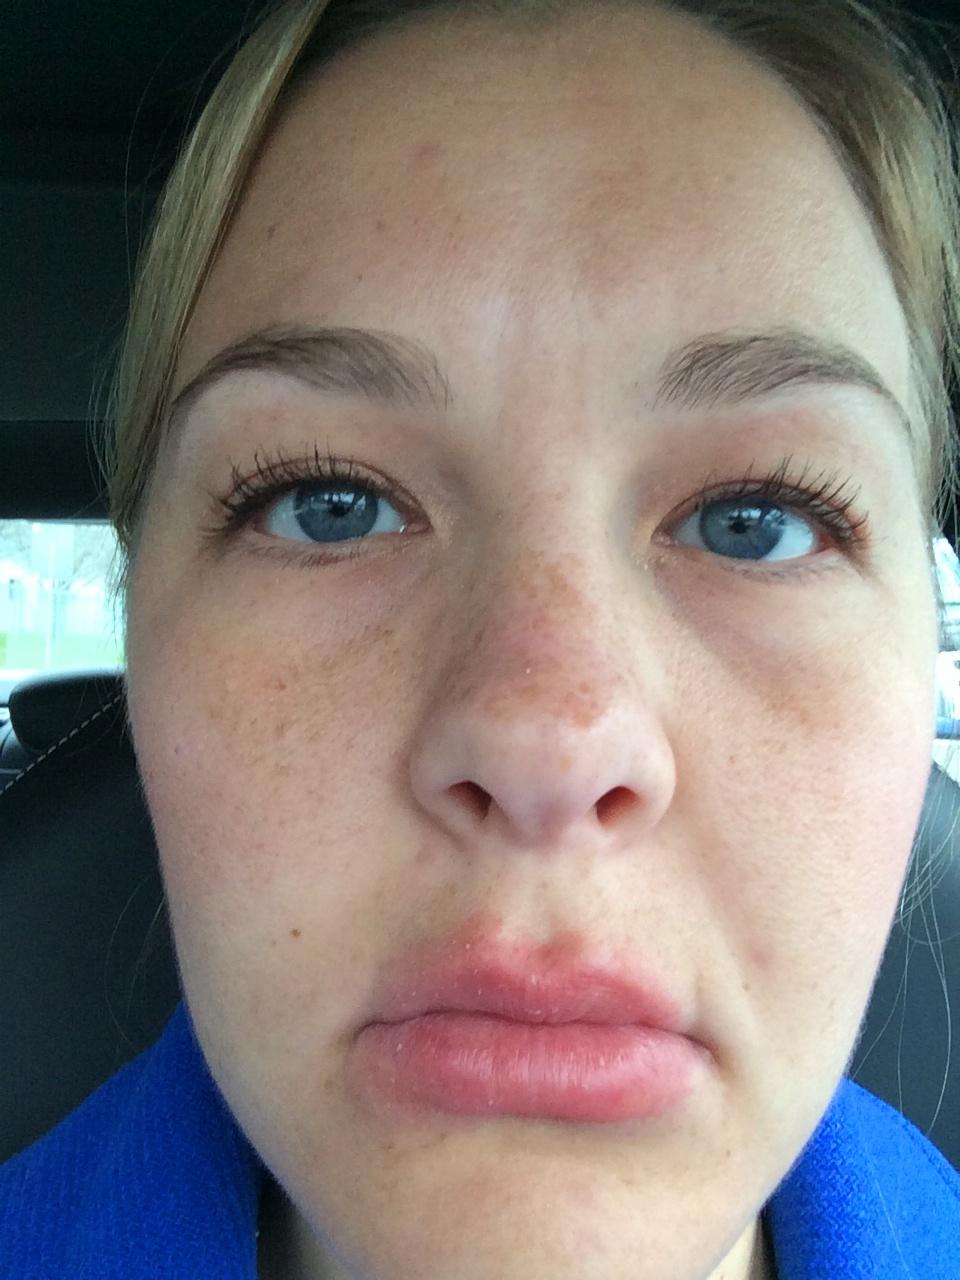 Allergic Reaction Testing, Symptoms & Treatment